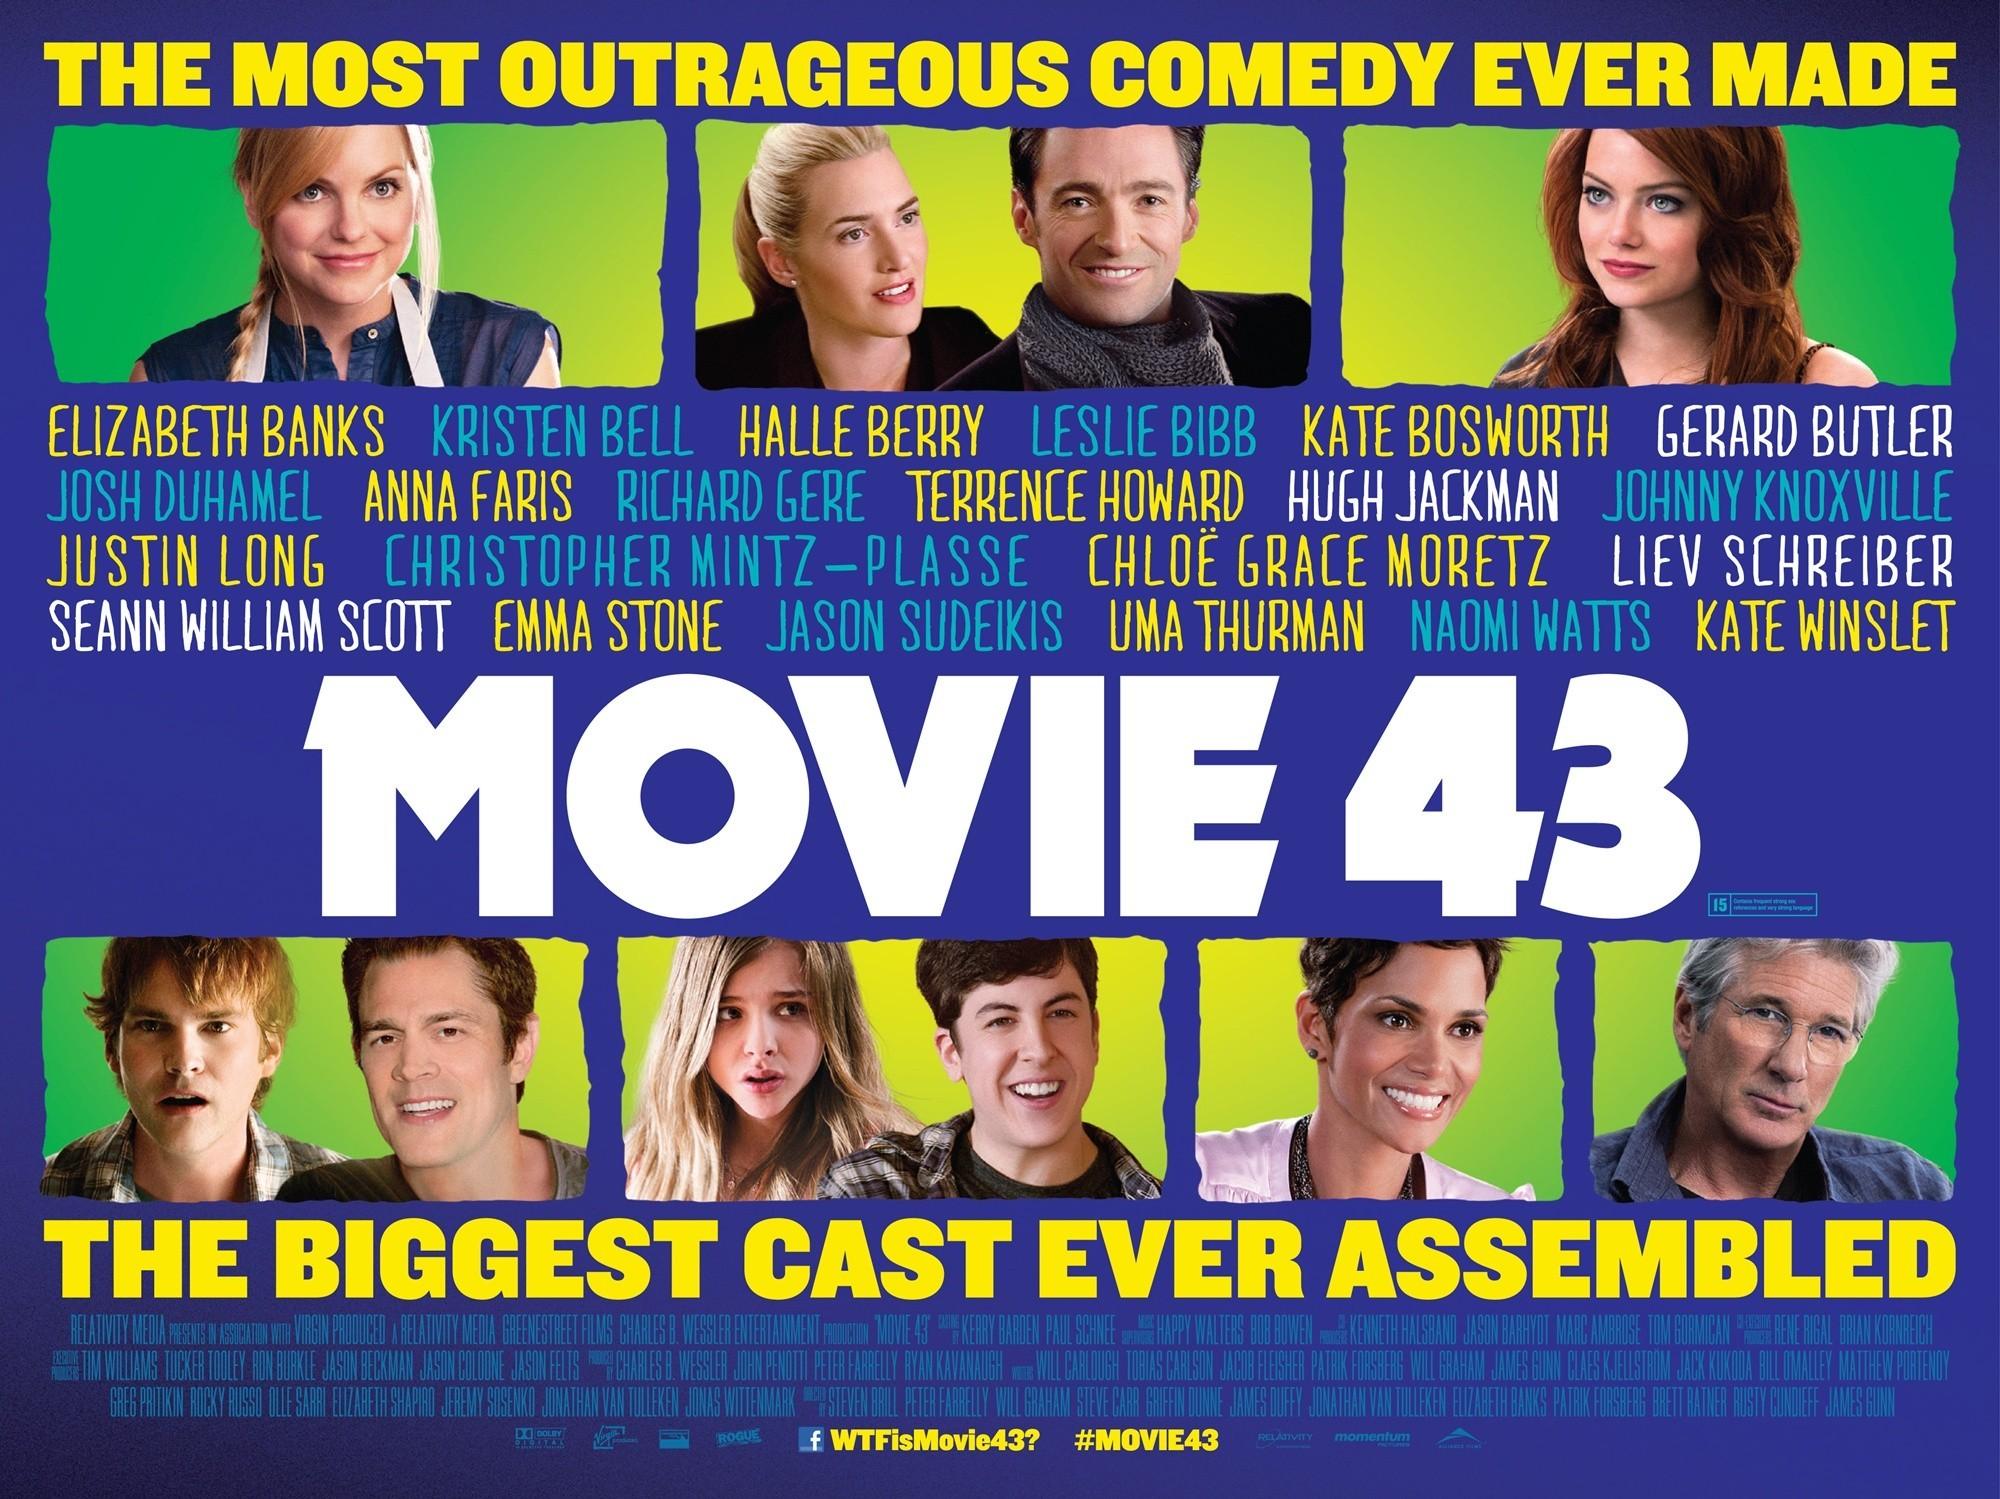 Movie 43 wallpaper 1